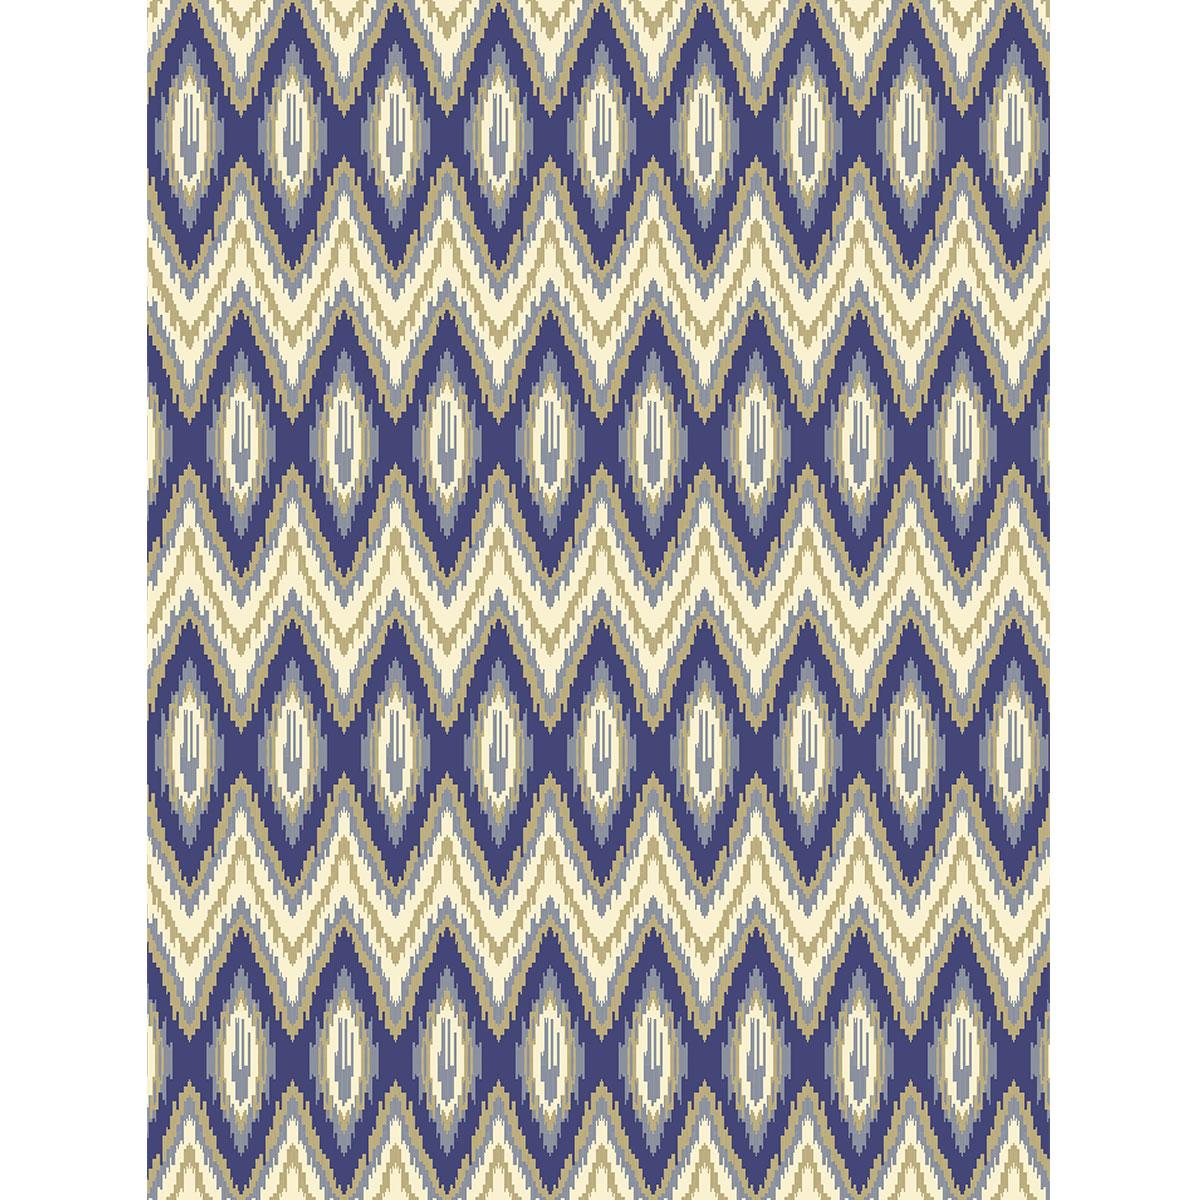 ziggy_wool-silk_hand-knotted_patterson-flynn-martin_pfm